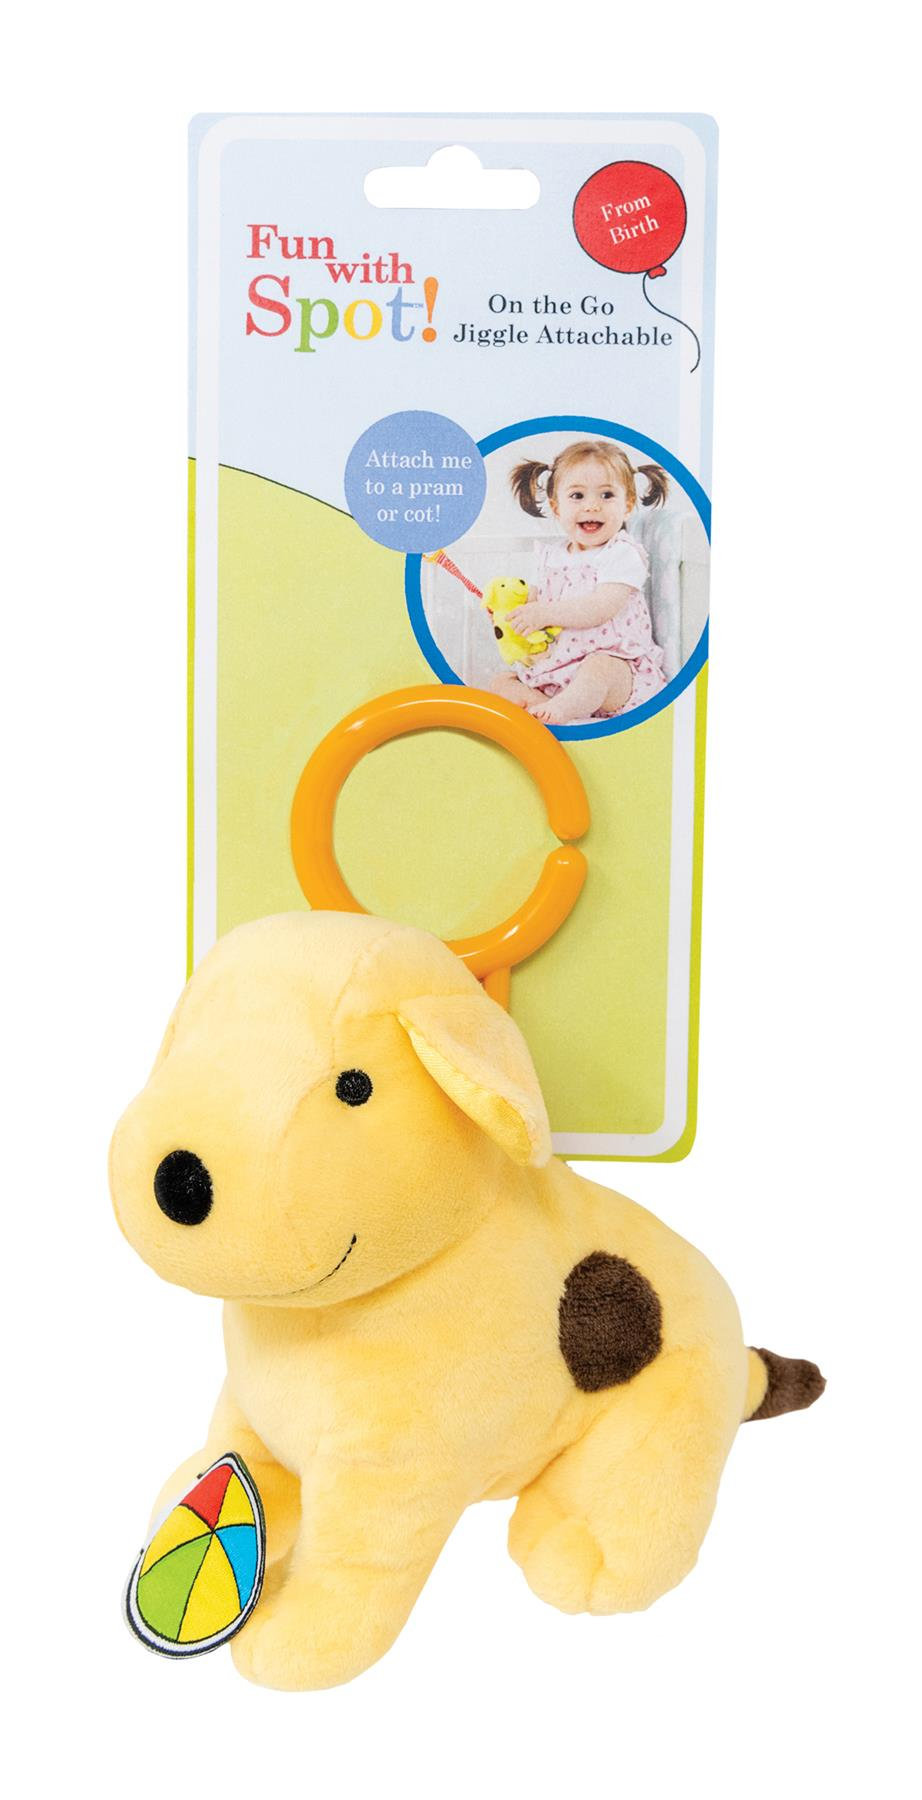 Rainbow Designs PADDINGTON FOR BABY JIGGLE ATTACHABLE Baby Toys Activities